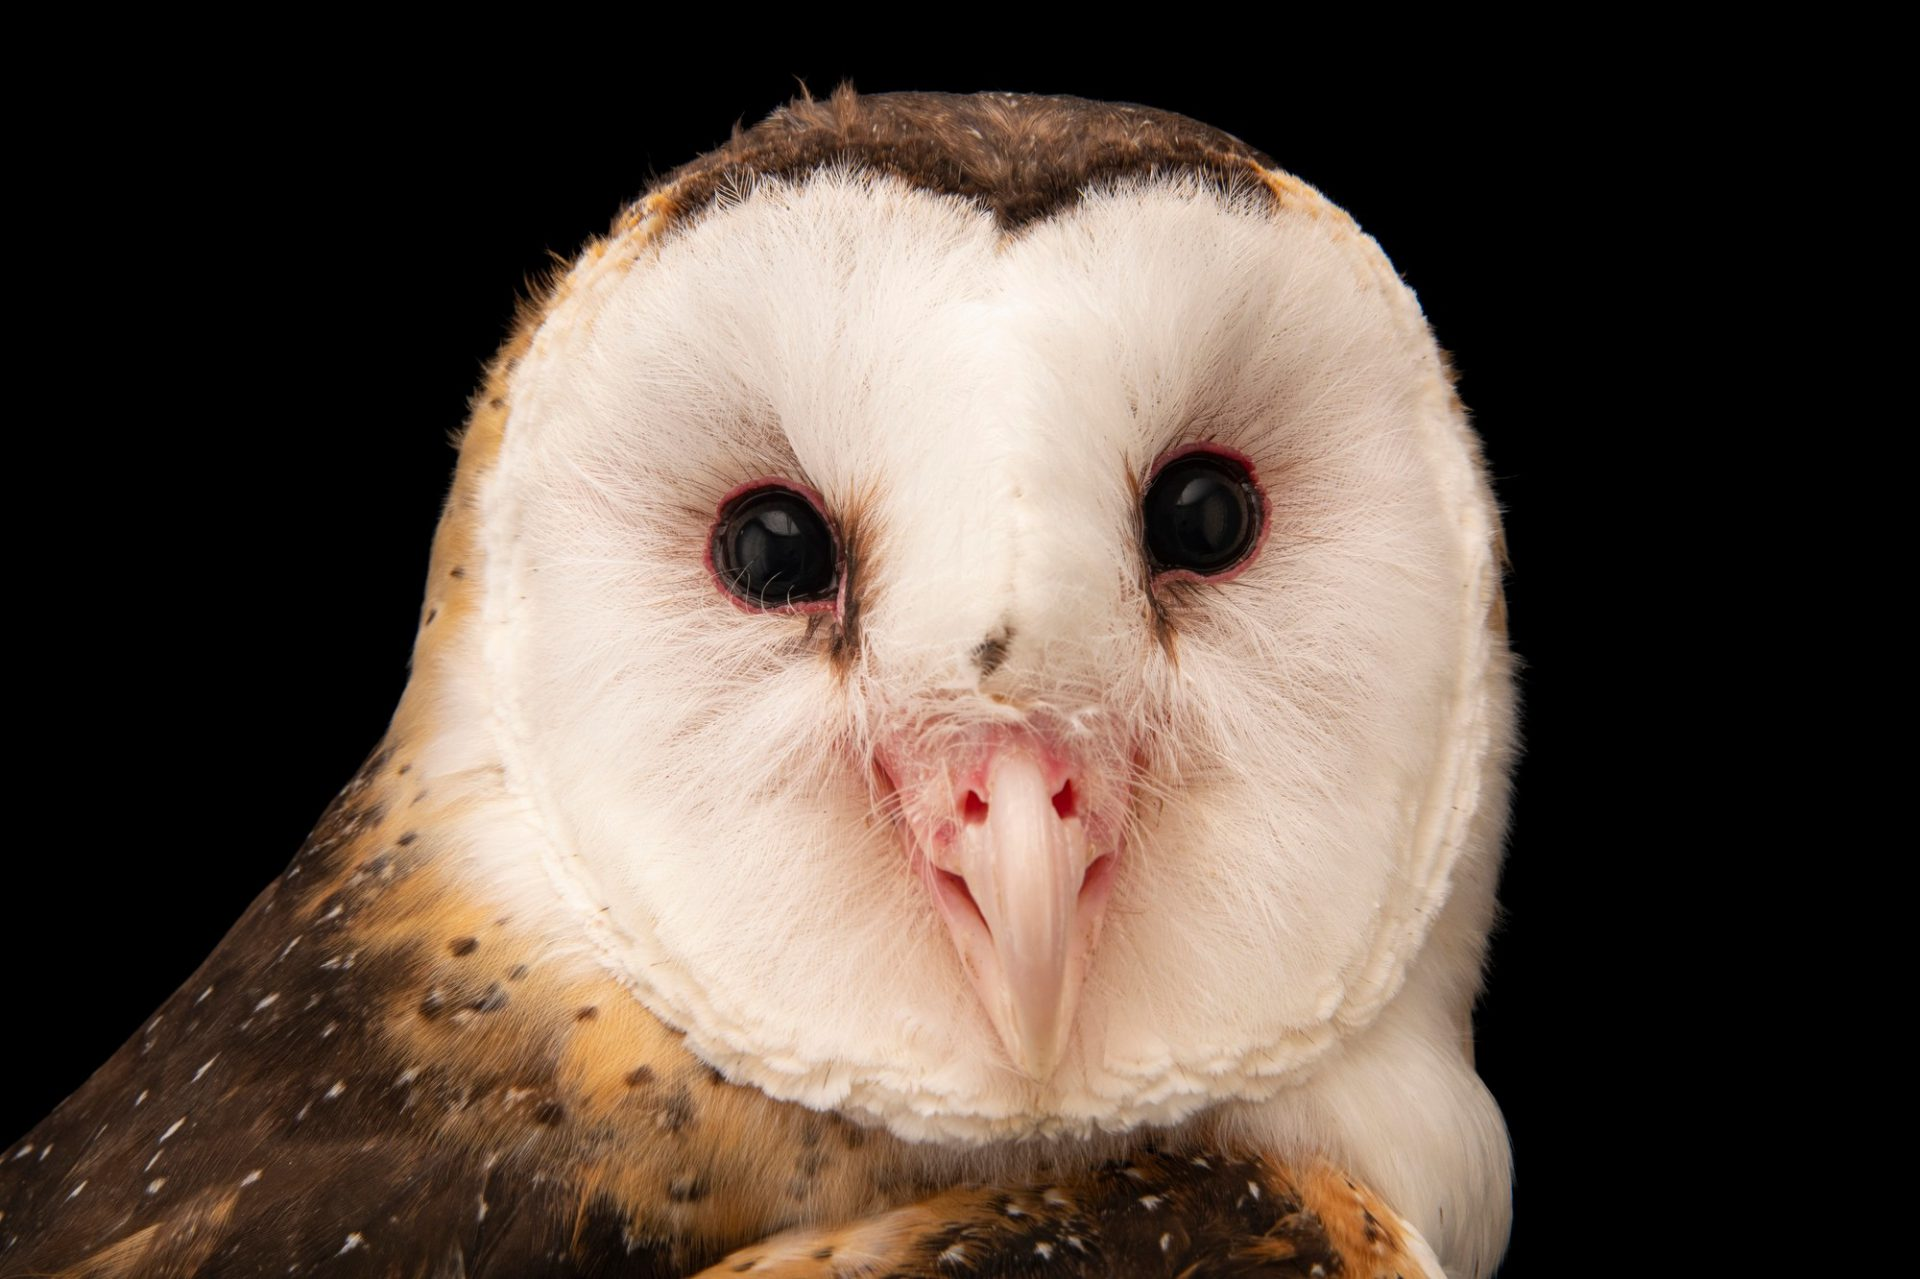 Photo: An Eastern grass owl (Tyto longimembris amauronota) at the Avilon Zoo.